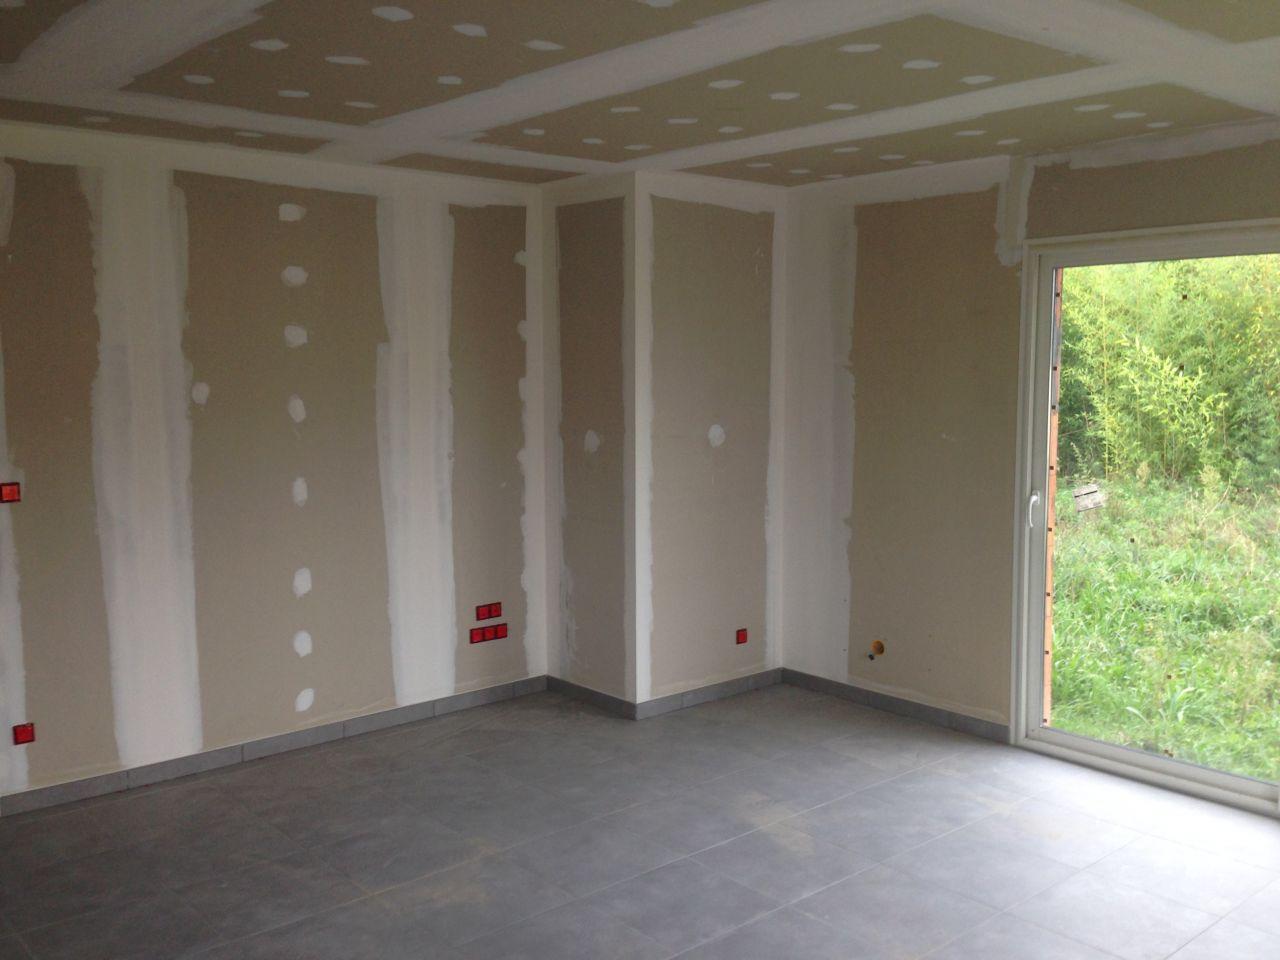 Carrelage escalier pos enduit de fa ade libourne for Carrelage pour facade exterieure